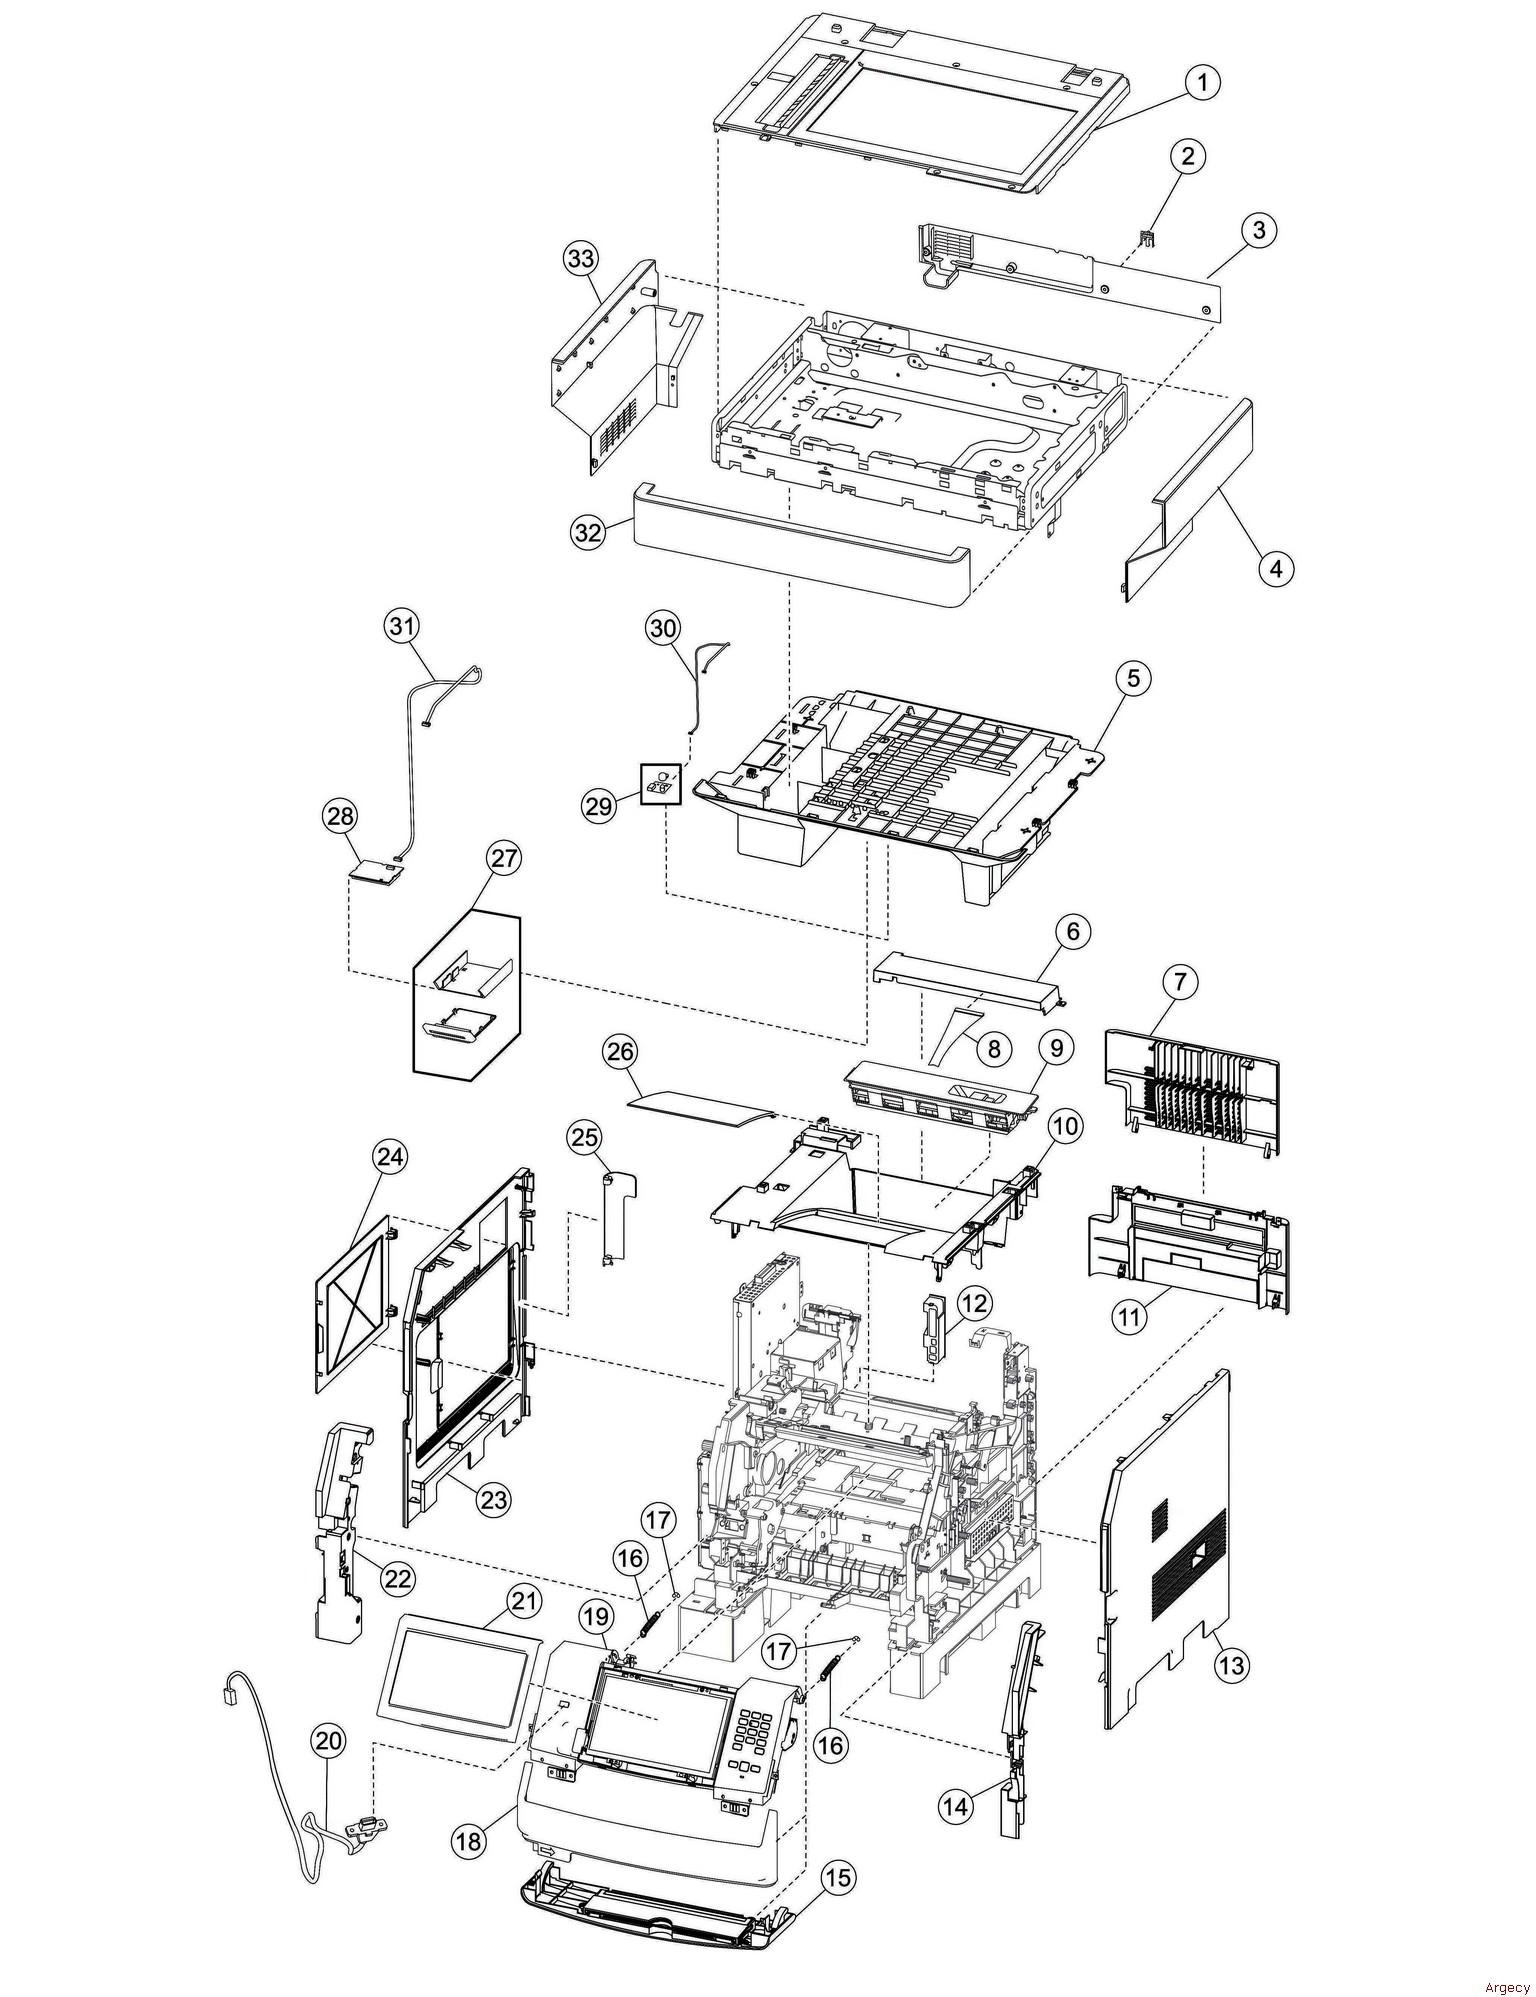 Ibm Infoprint Mfp Parts